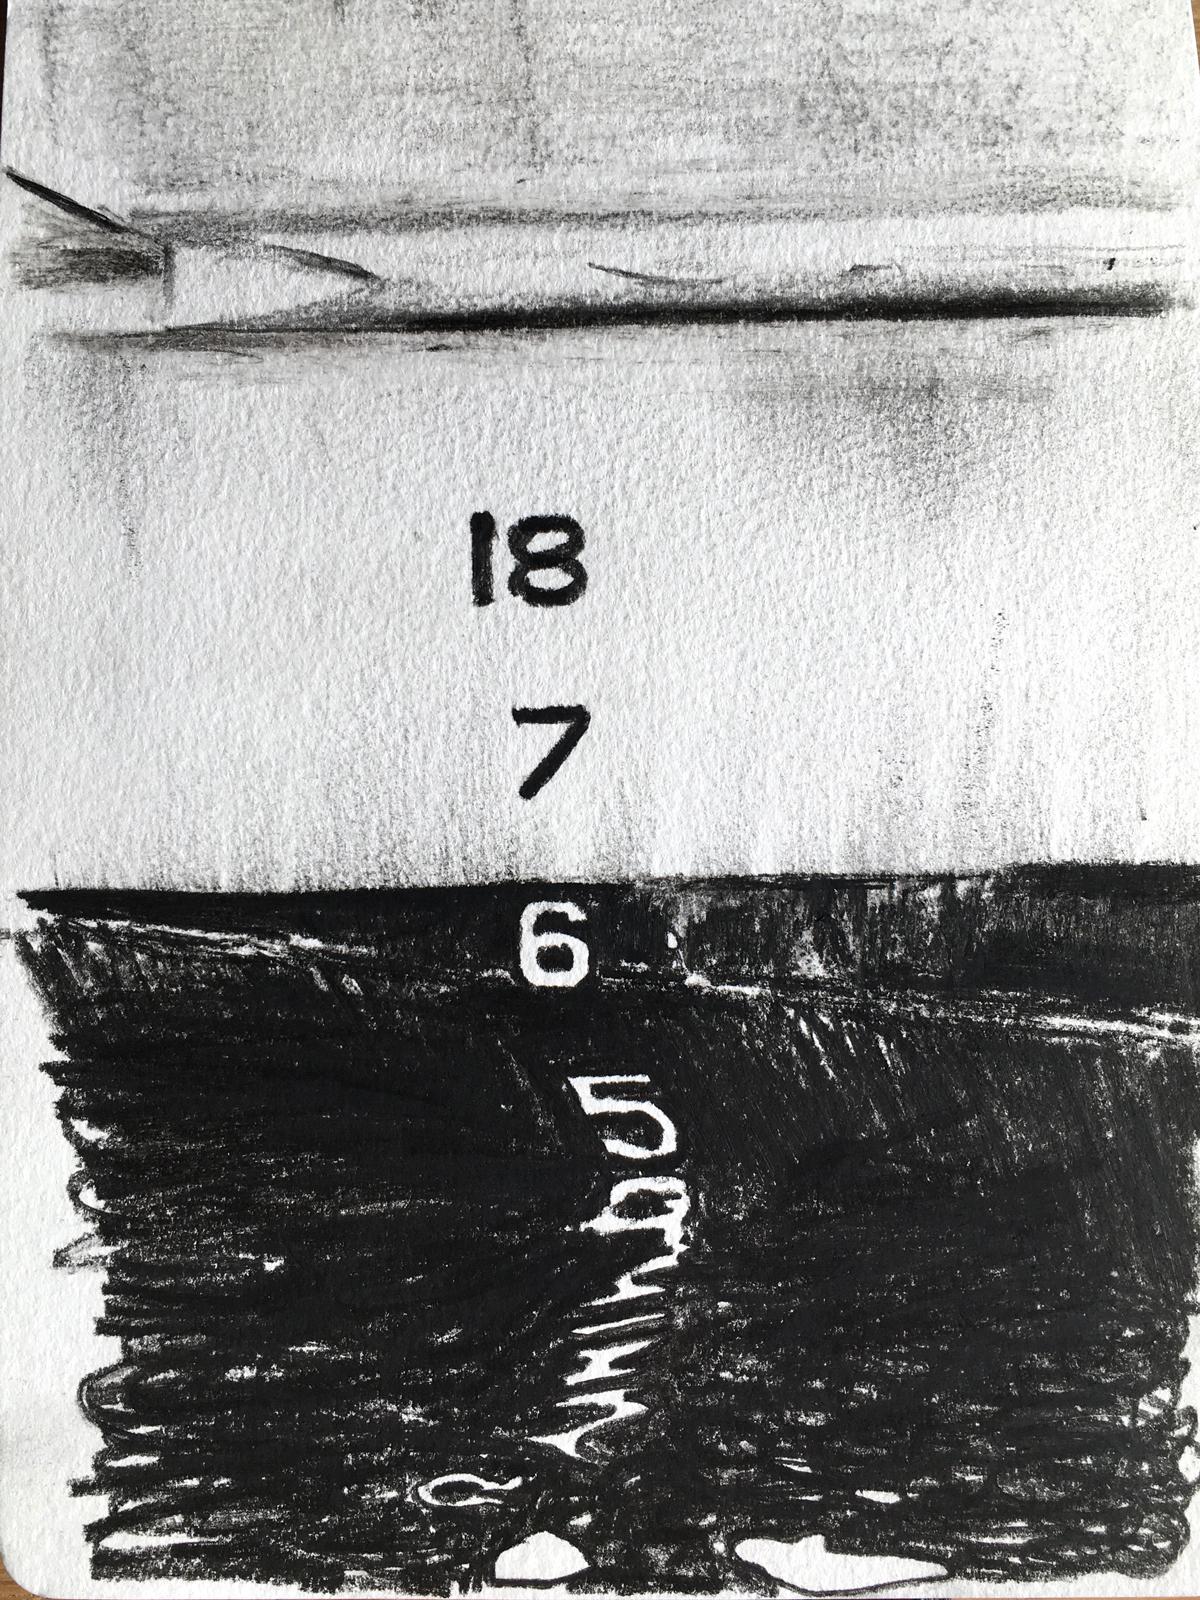 Hull of DSSV Pressure Drop, Alexandra Gould